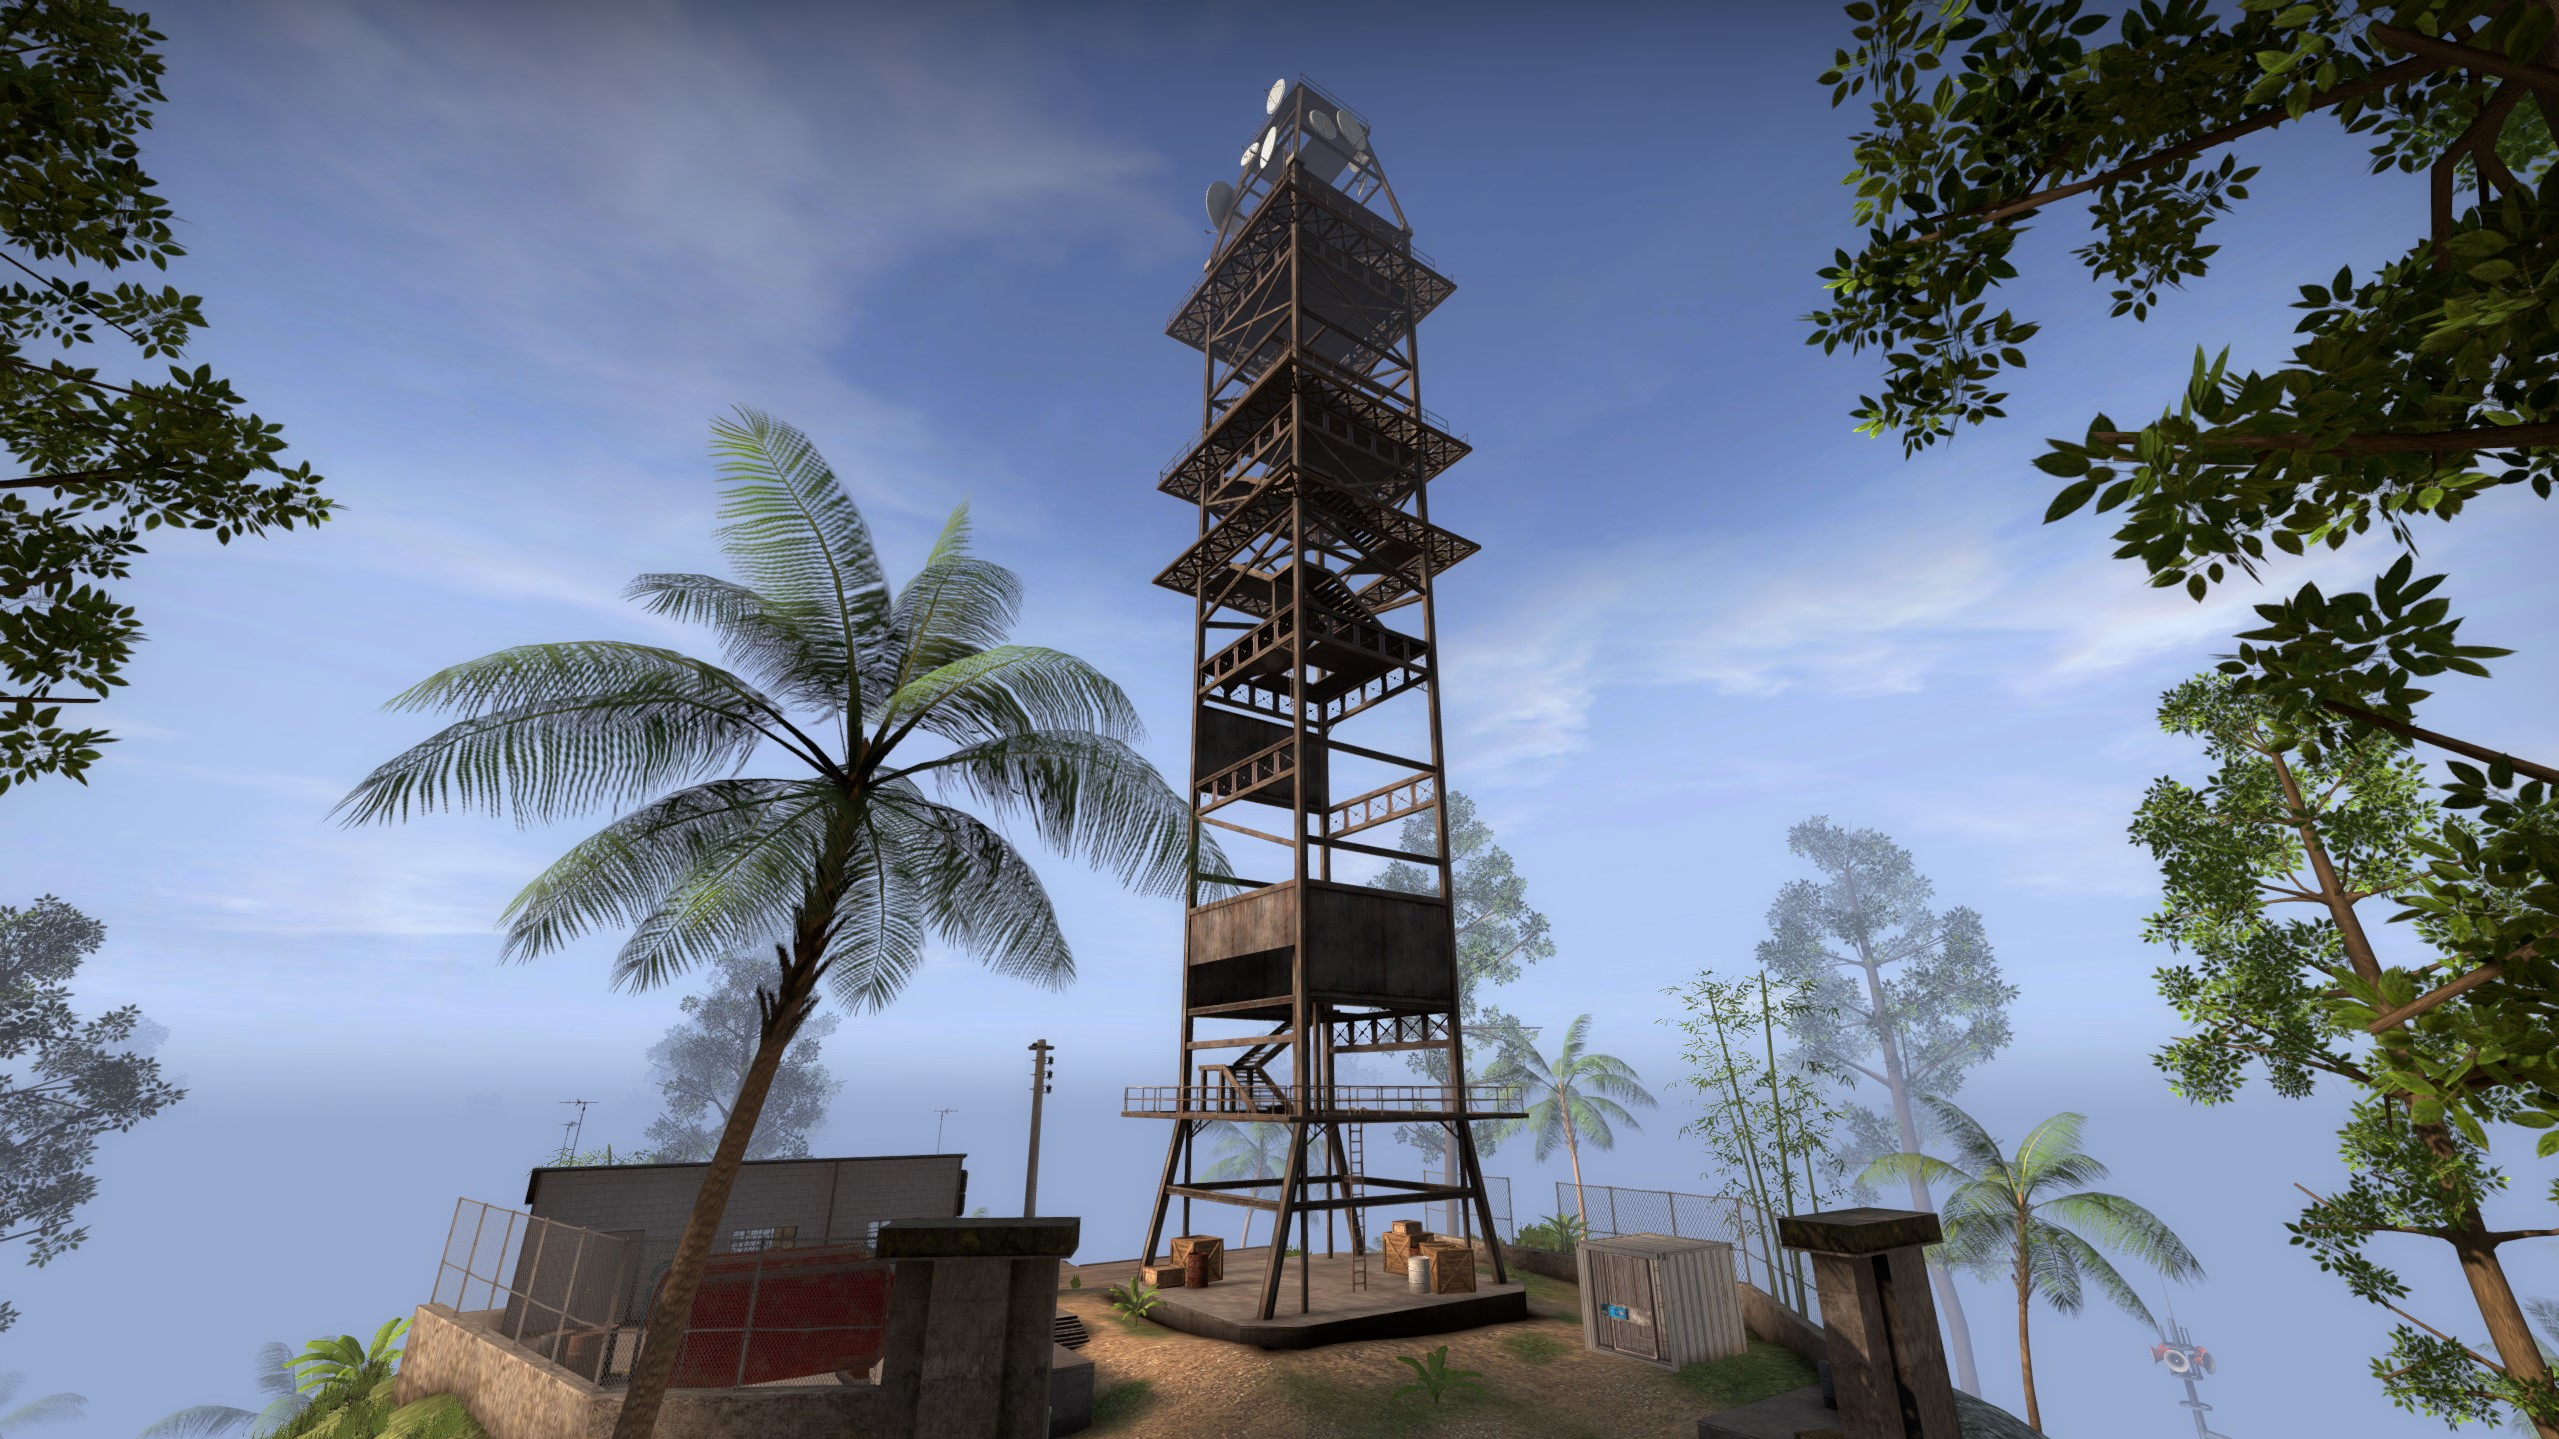 CS GO Danger Zone Jungle Radio